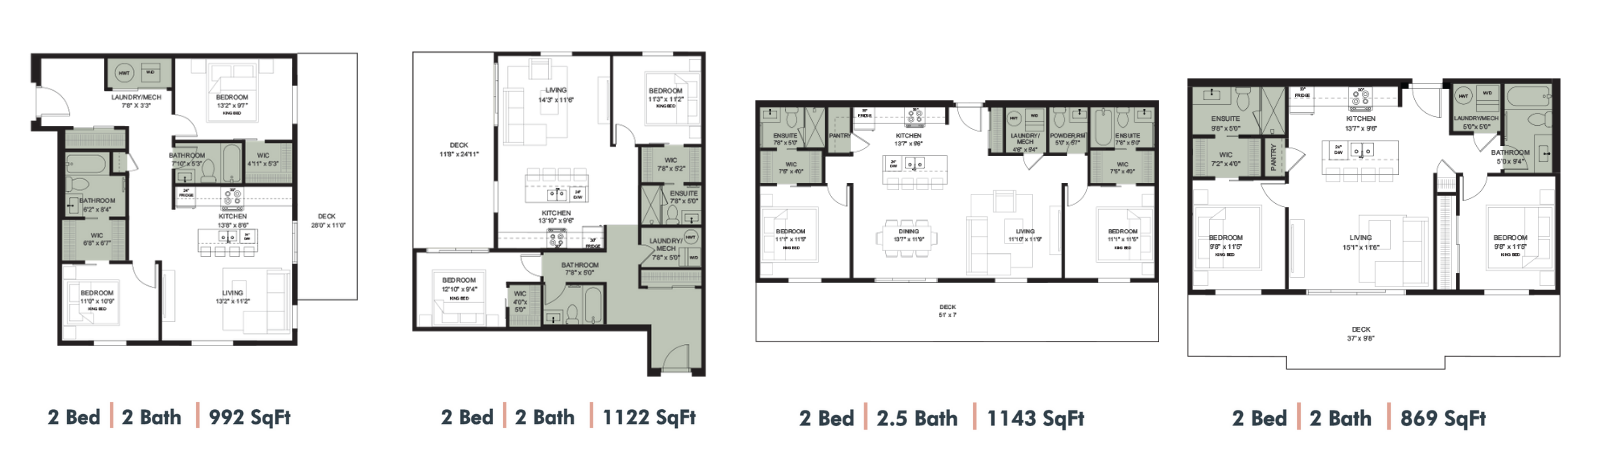 Cawston Floor Plans 2